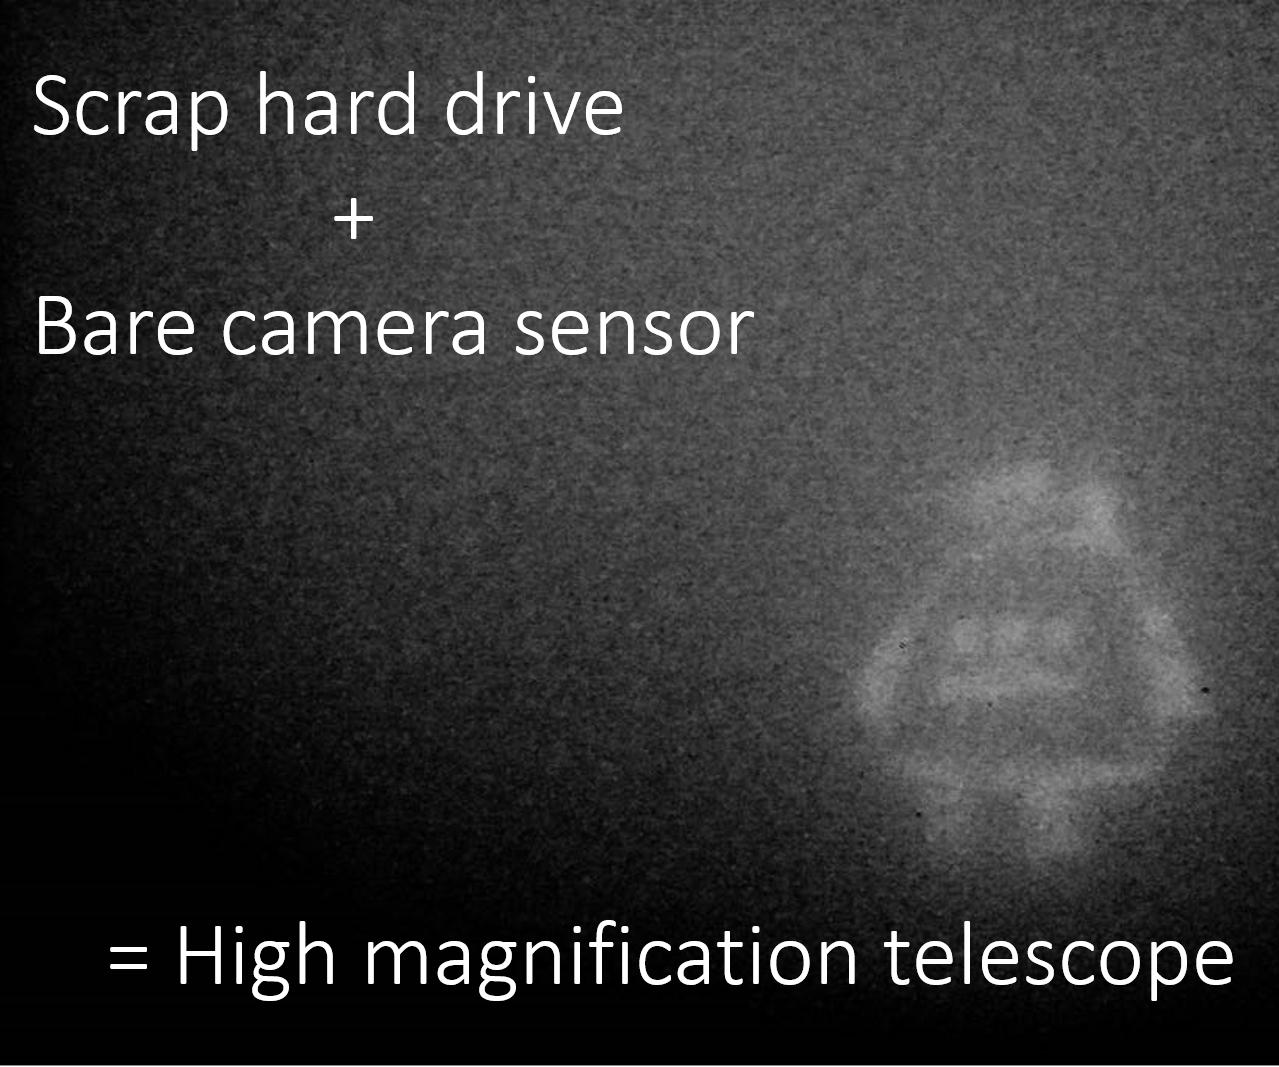 Aragoscope Scrap Hard Disc As A Prototype Space Telescope 7 Steps